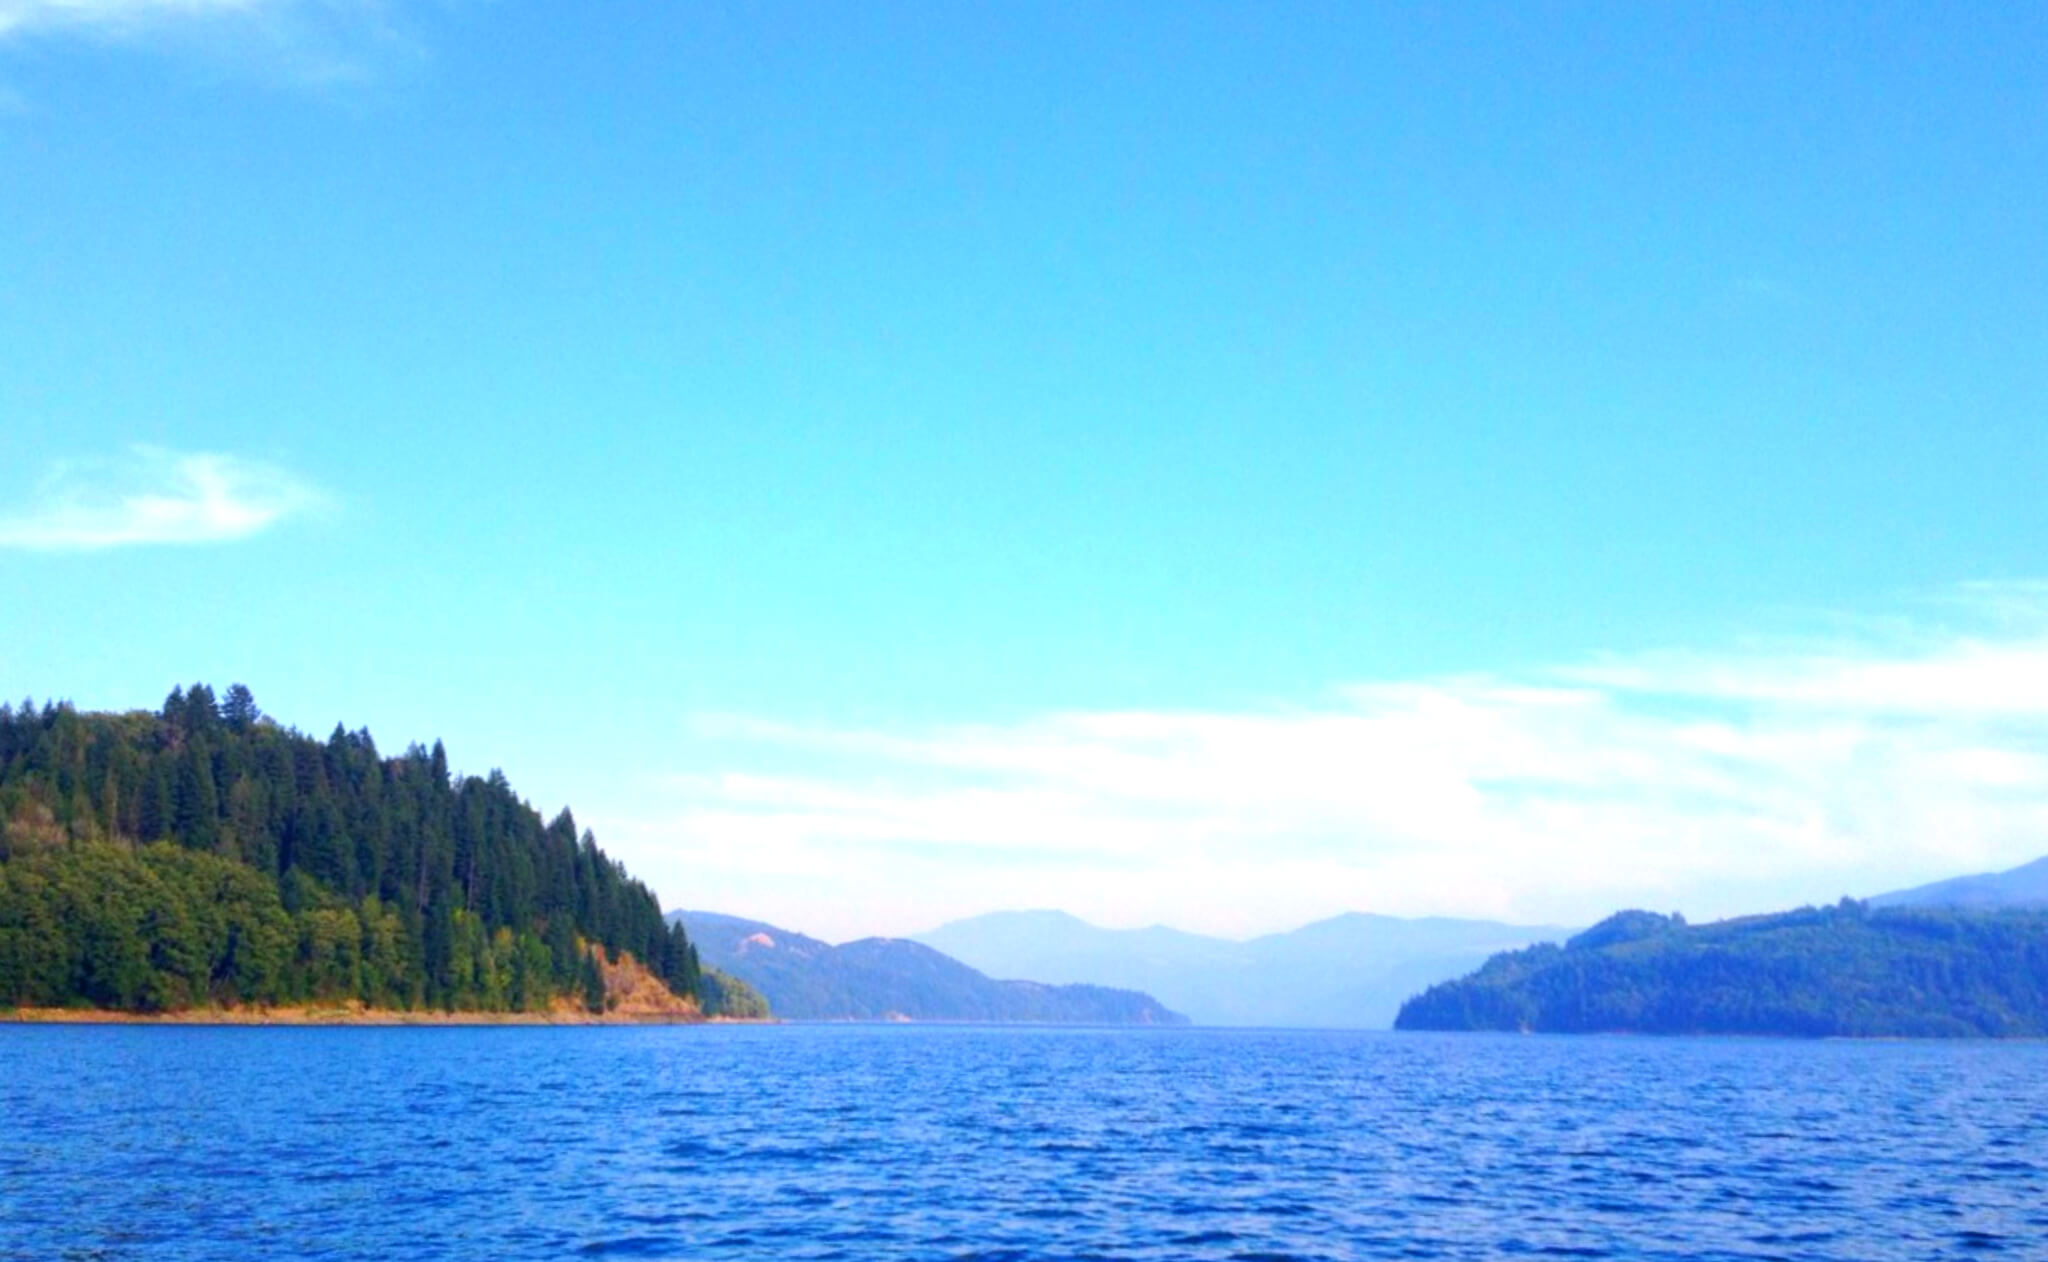 Riffe-Lake-Fishing-Report-Guide-Washington-WA-04